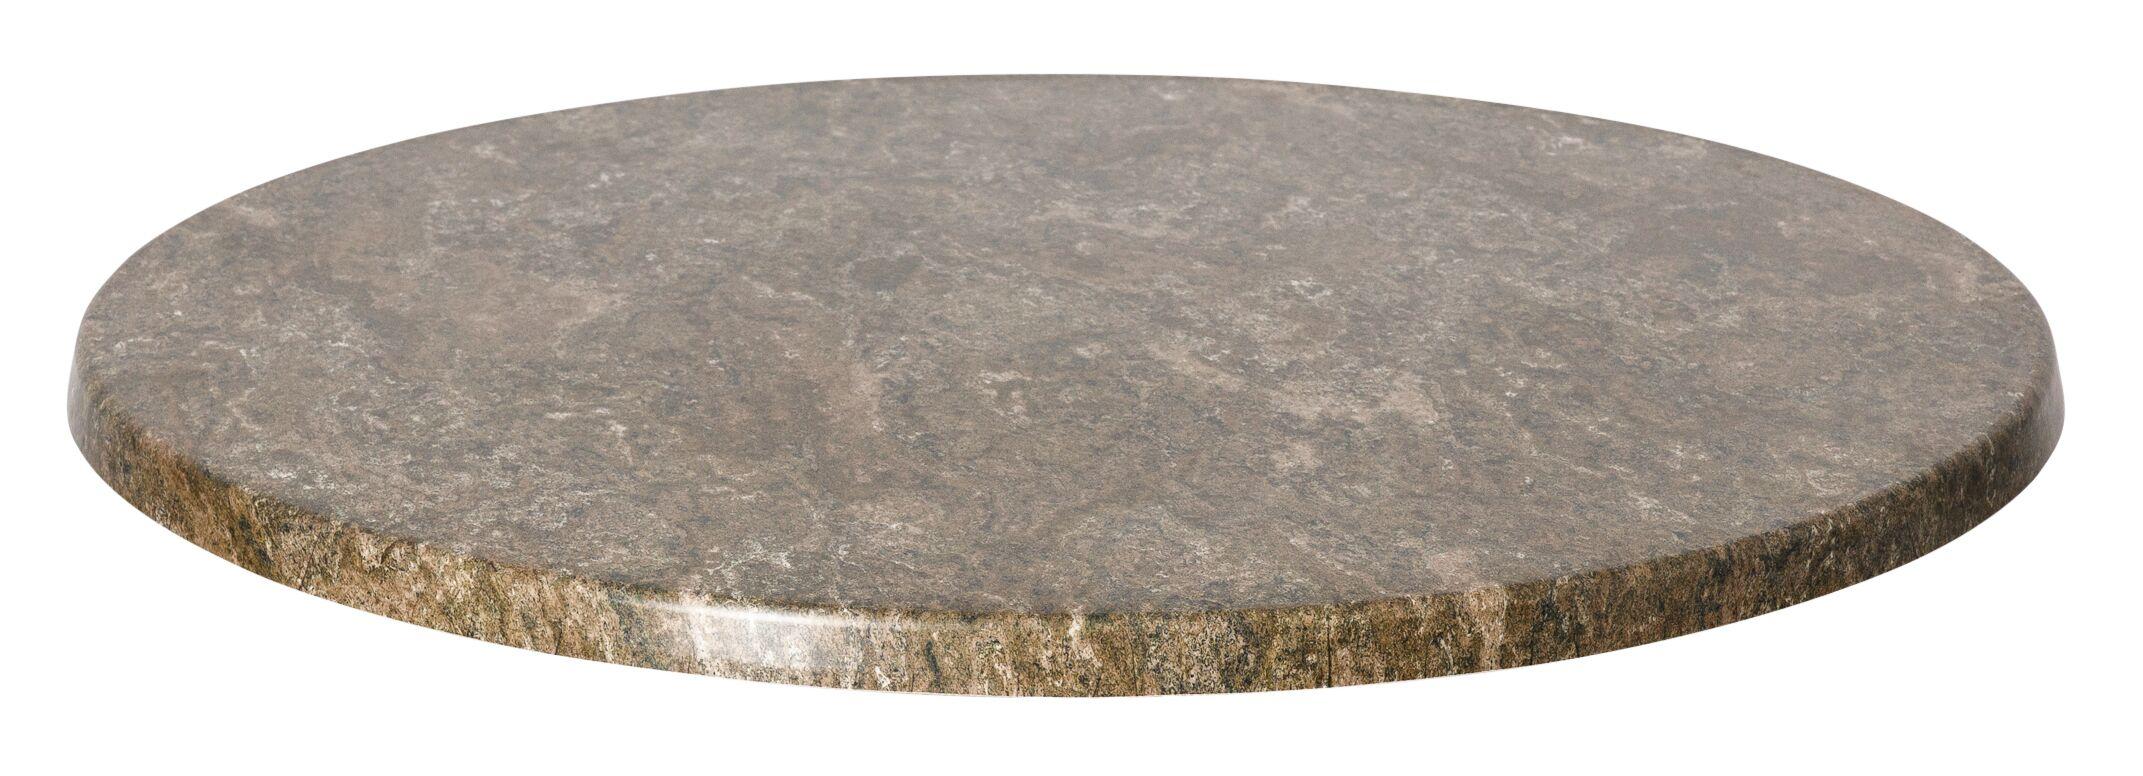 SoHo Table Top Color: Gray Slate, Size: 36